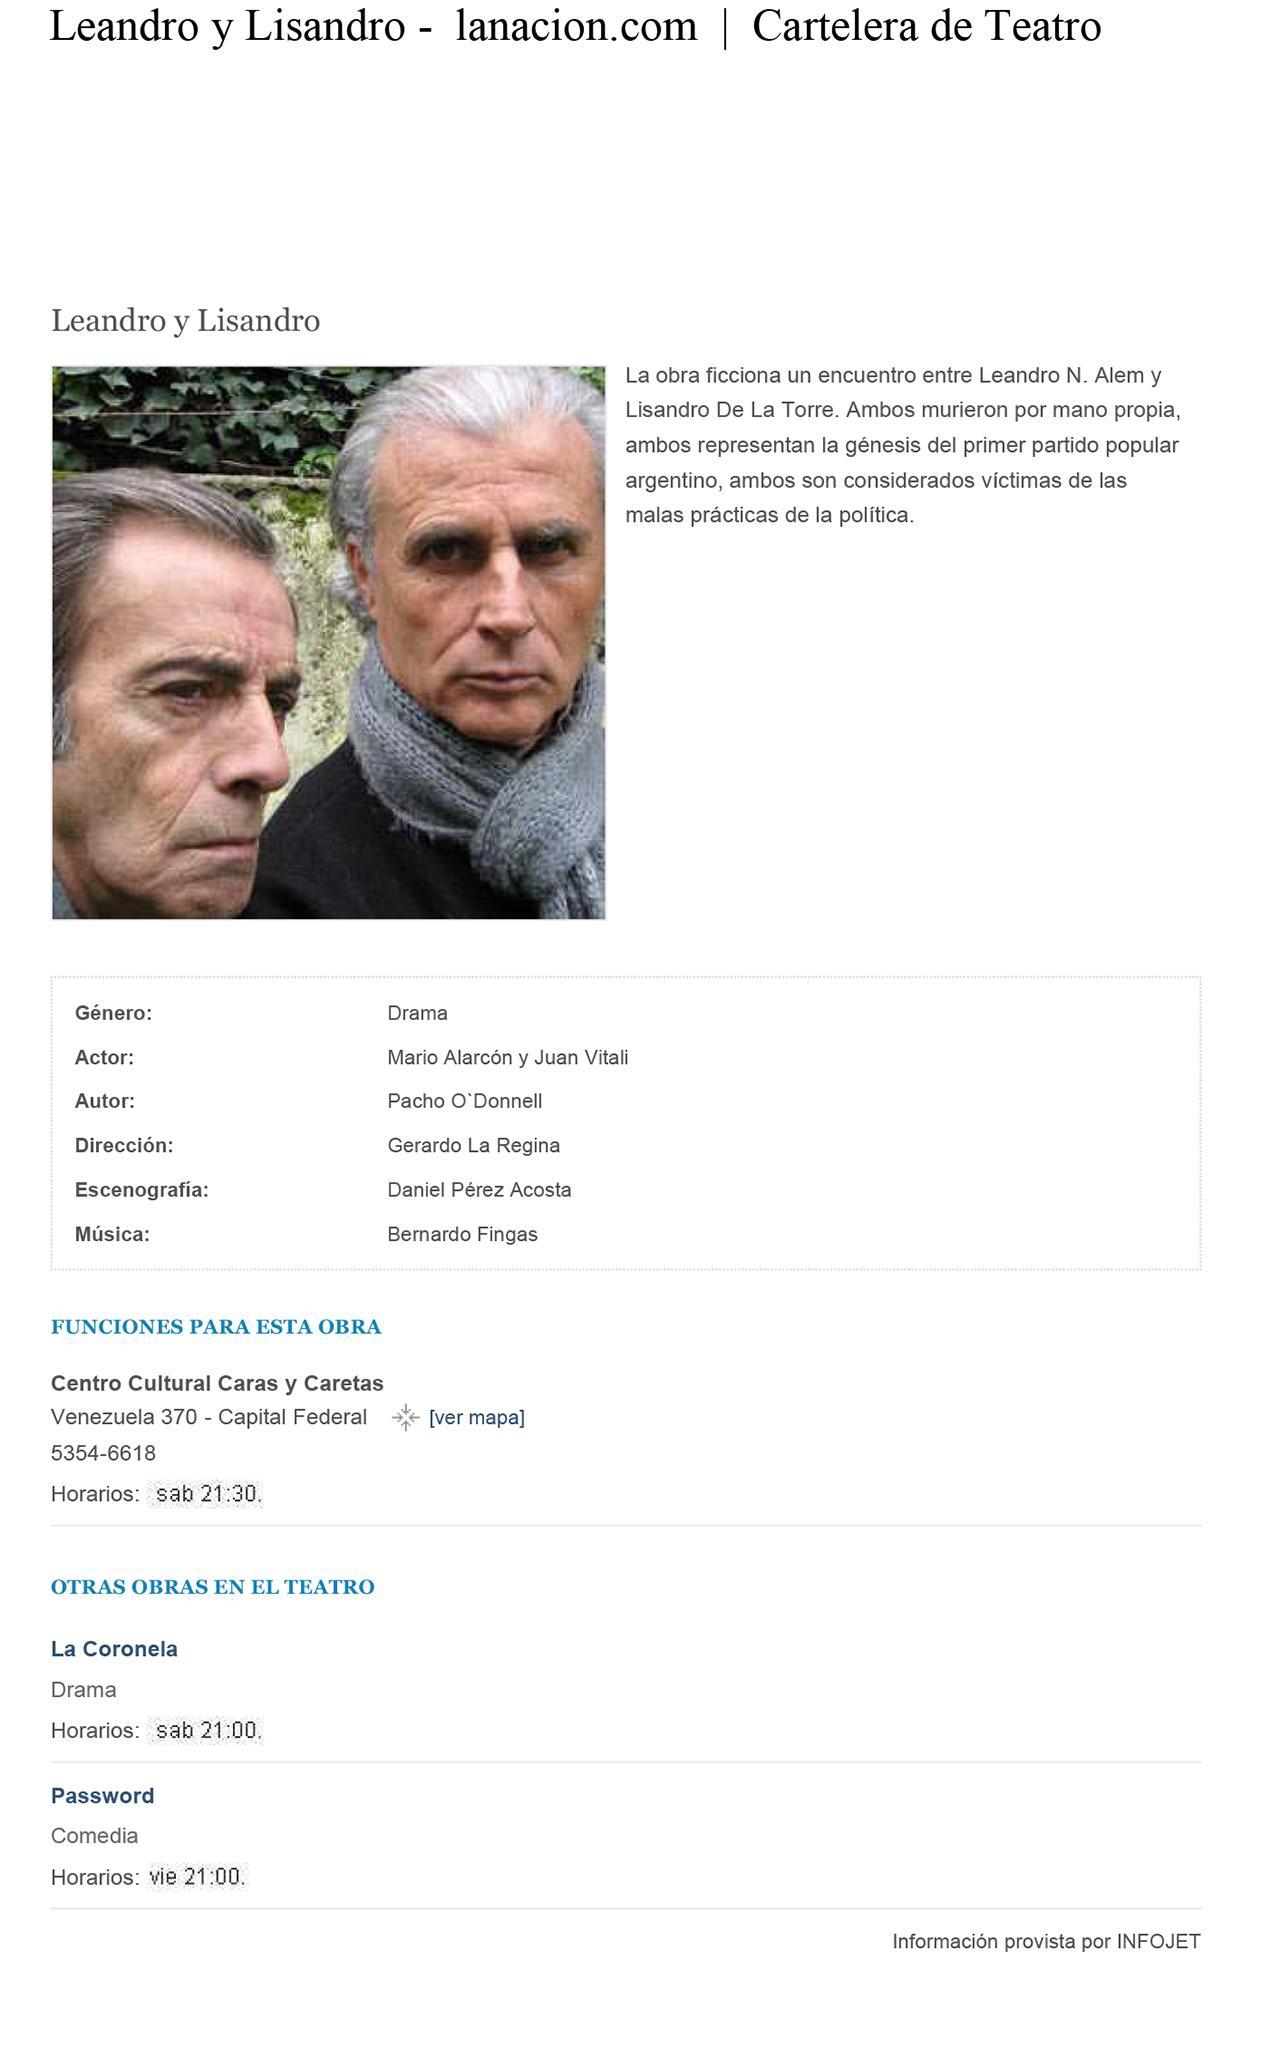 http://www.lanacion.com.ar/espectaculos/cartelera-teatro/obraFi